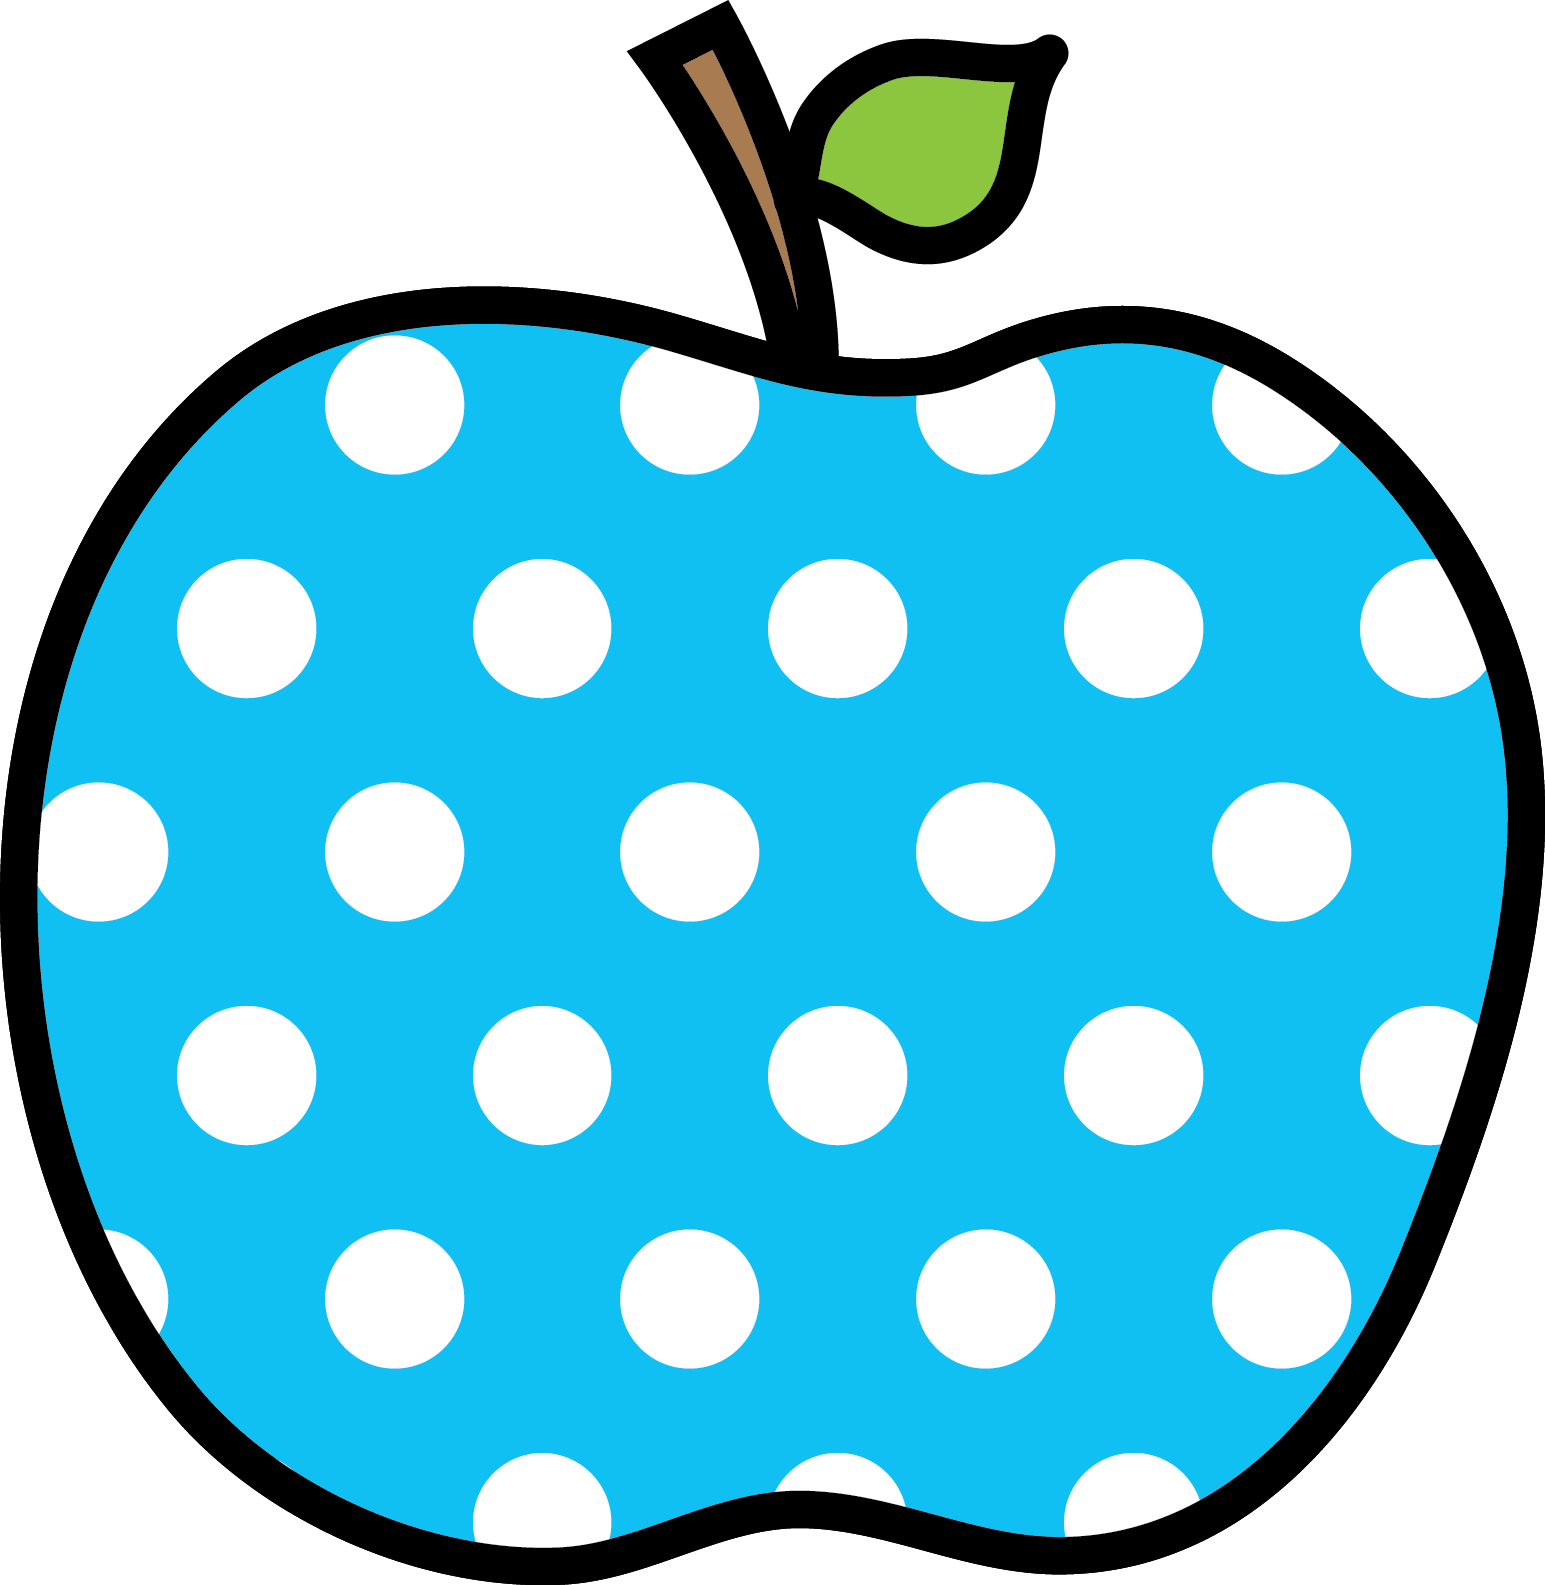 Apples polka dot